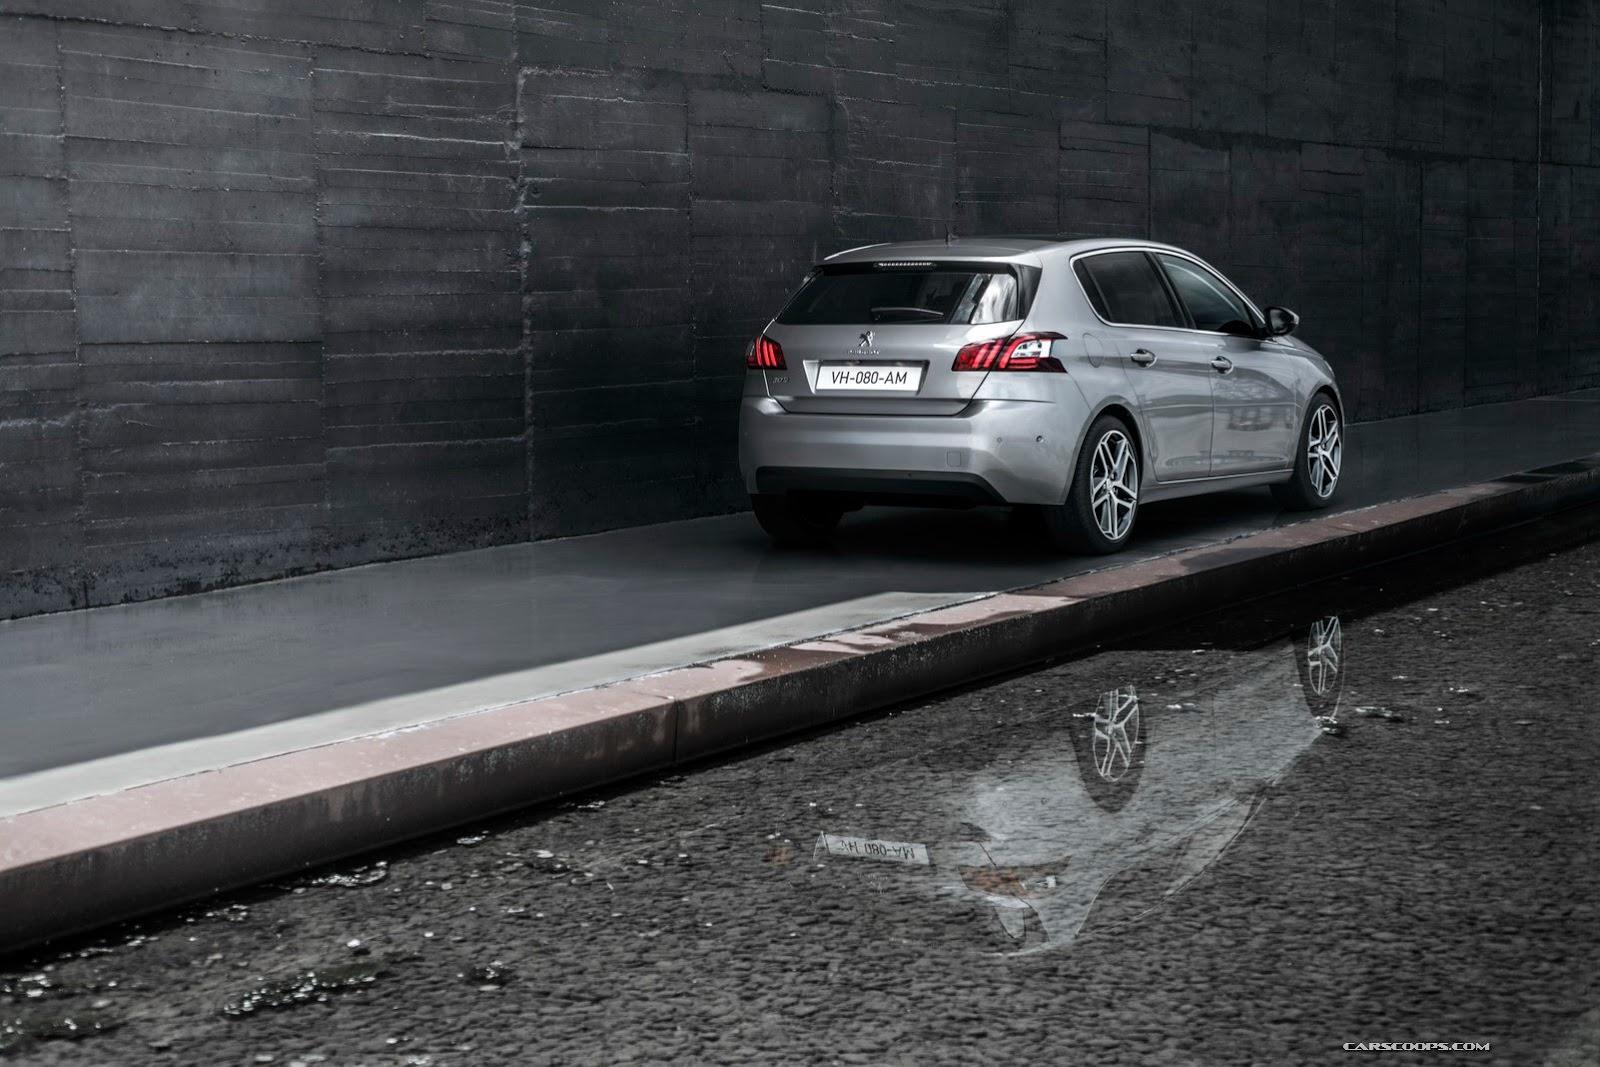 2014-Peugeot-308-Hatch-Carscoops-75%25255B2%25255D.jpg